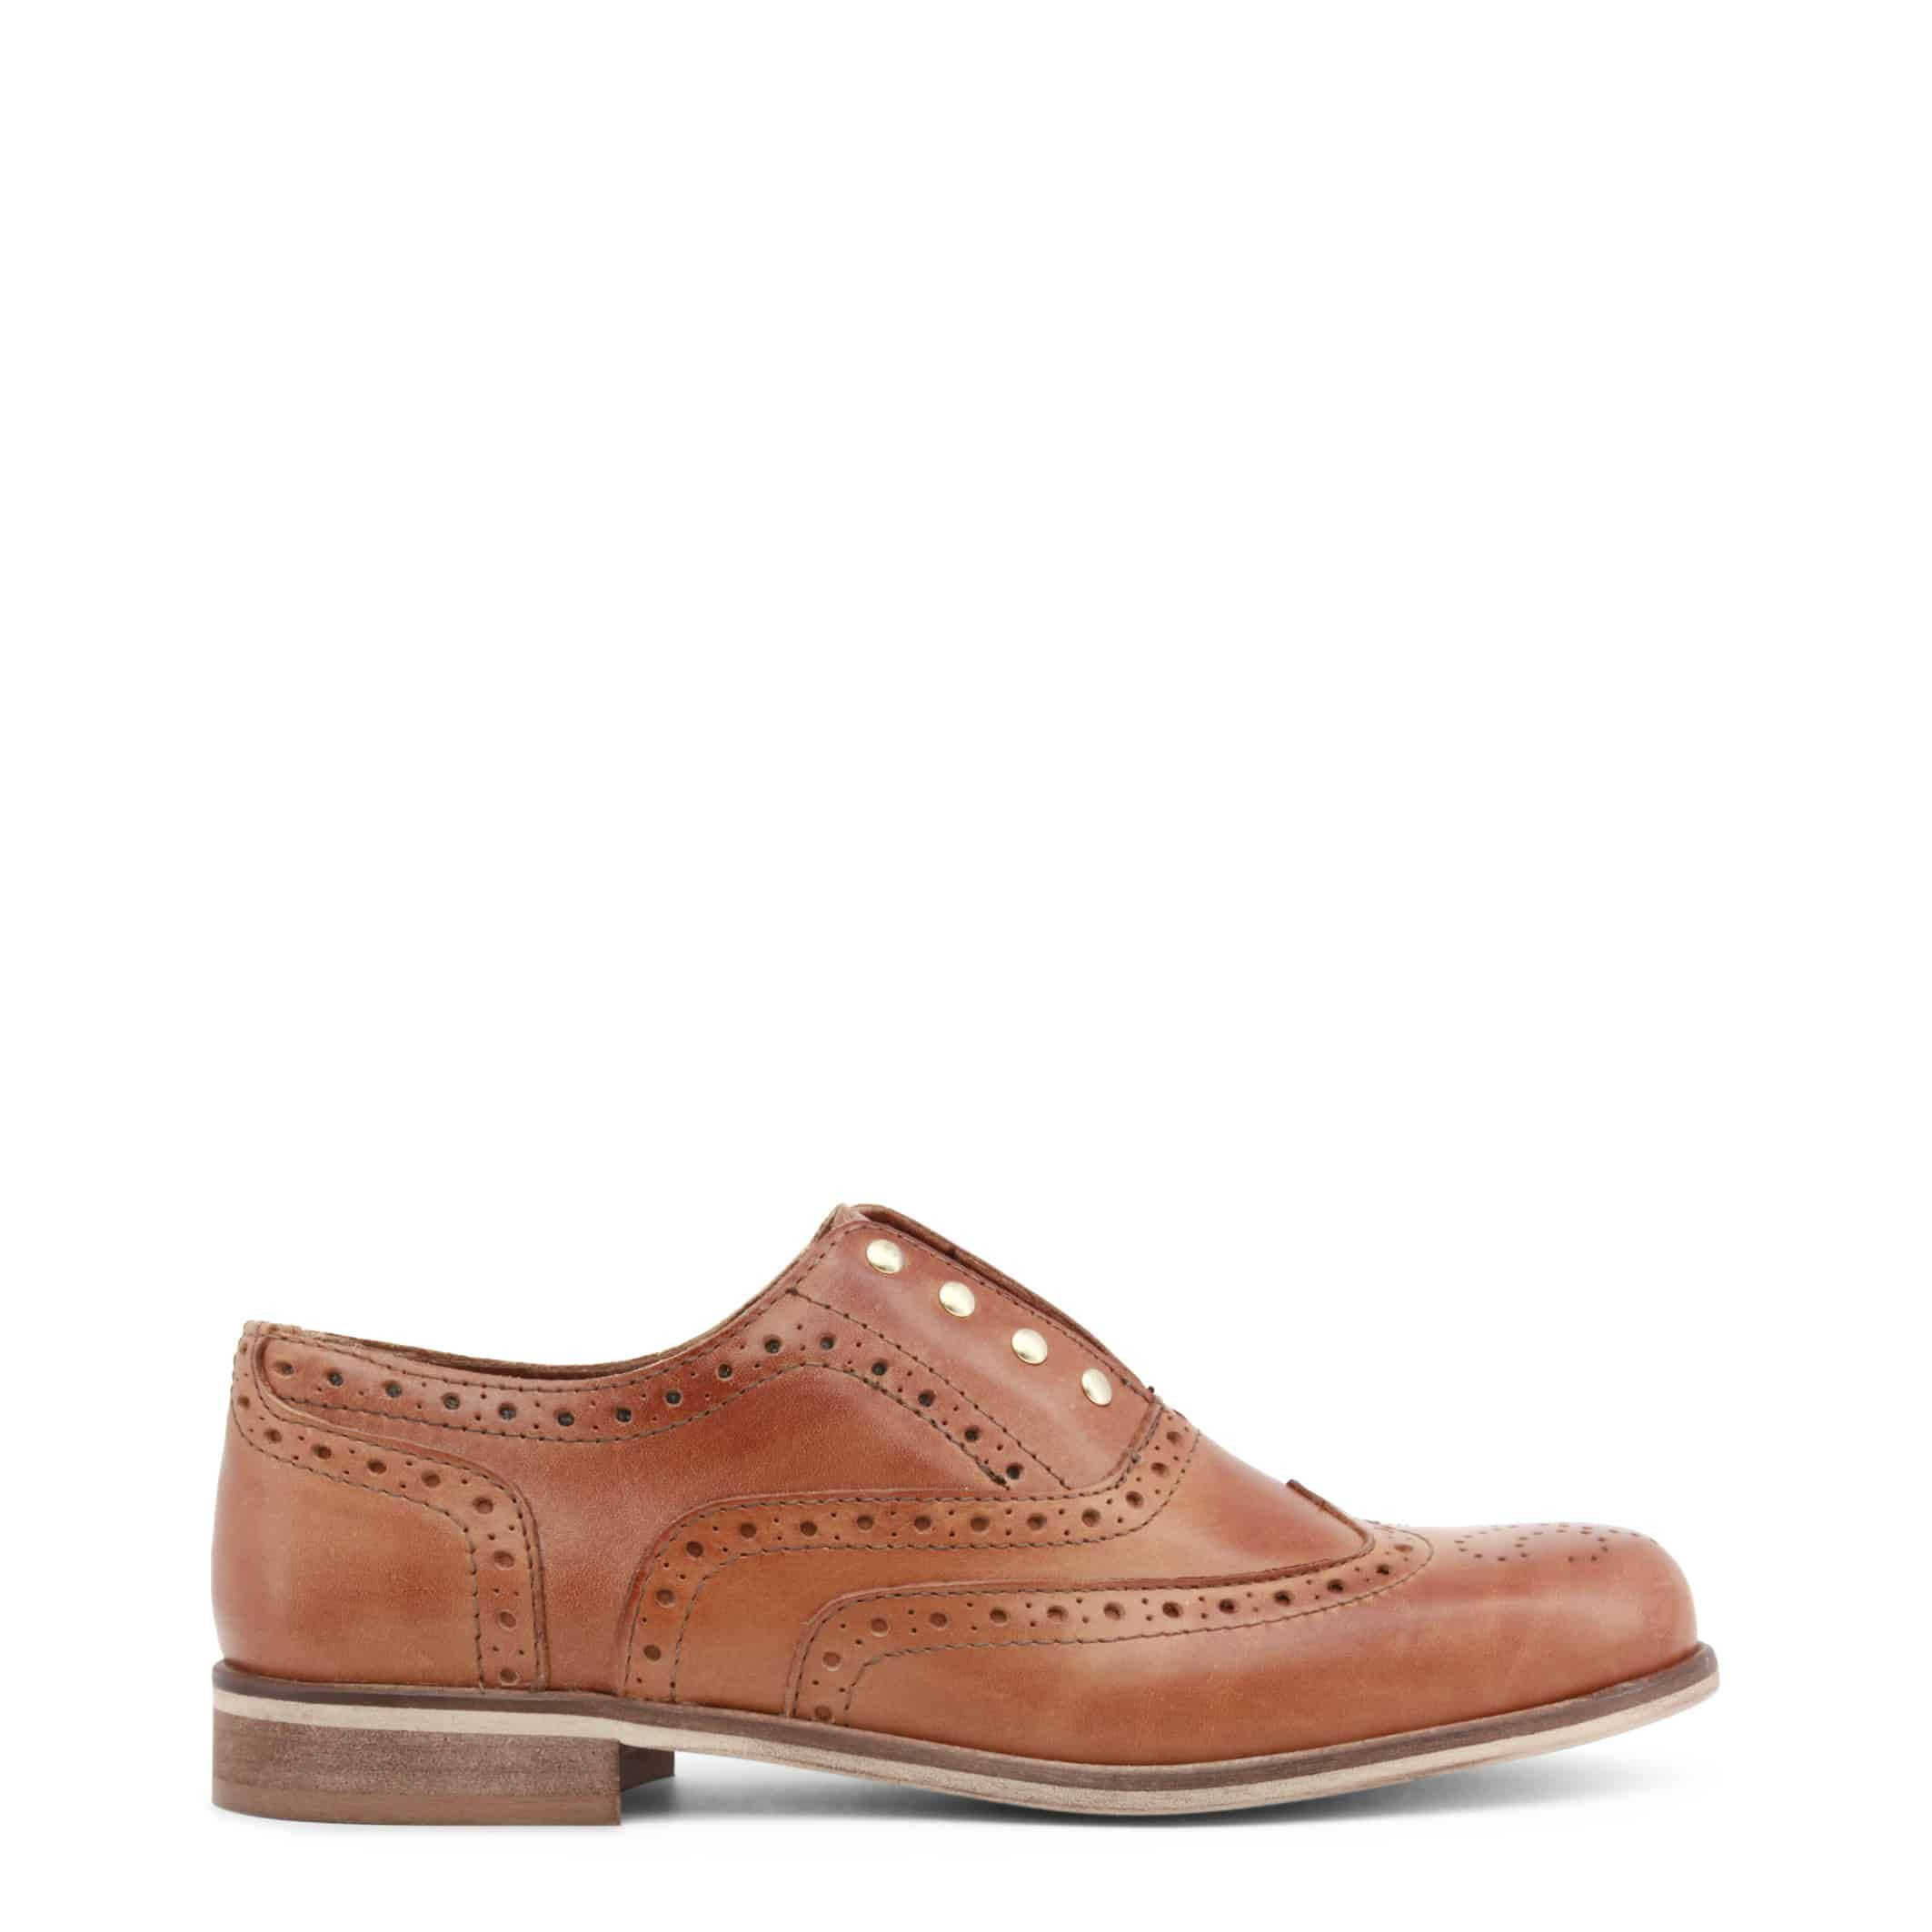 Chaussures classiques Made in Italia – TEOREMA